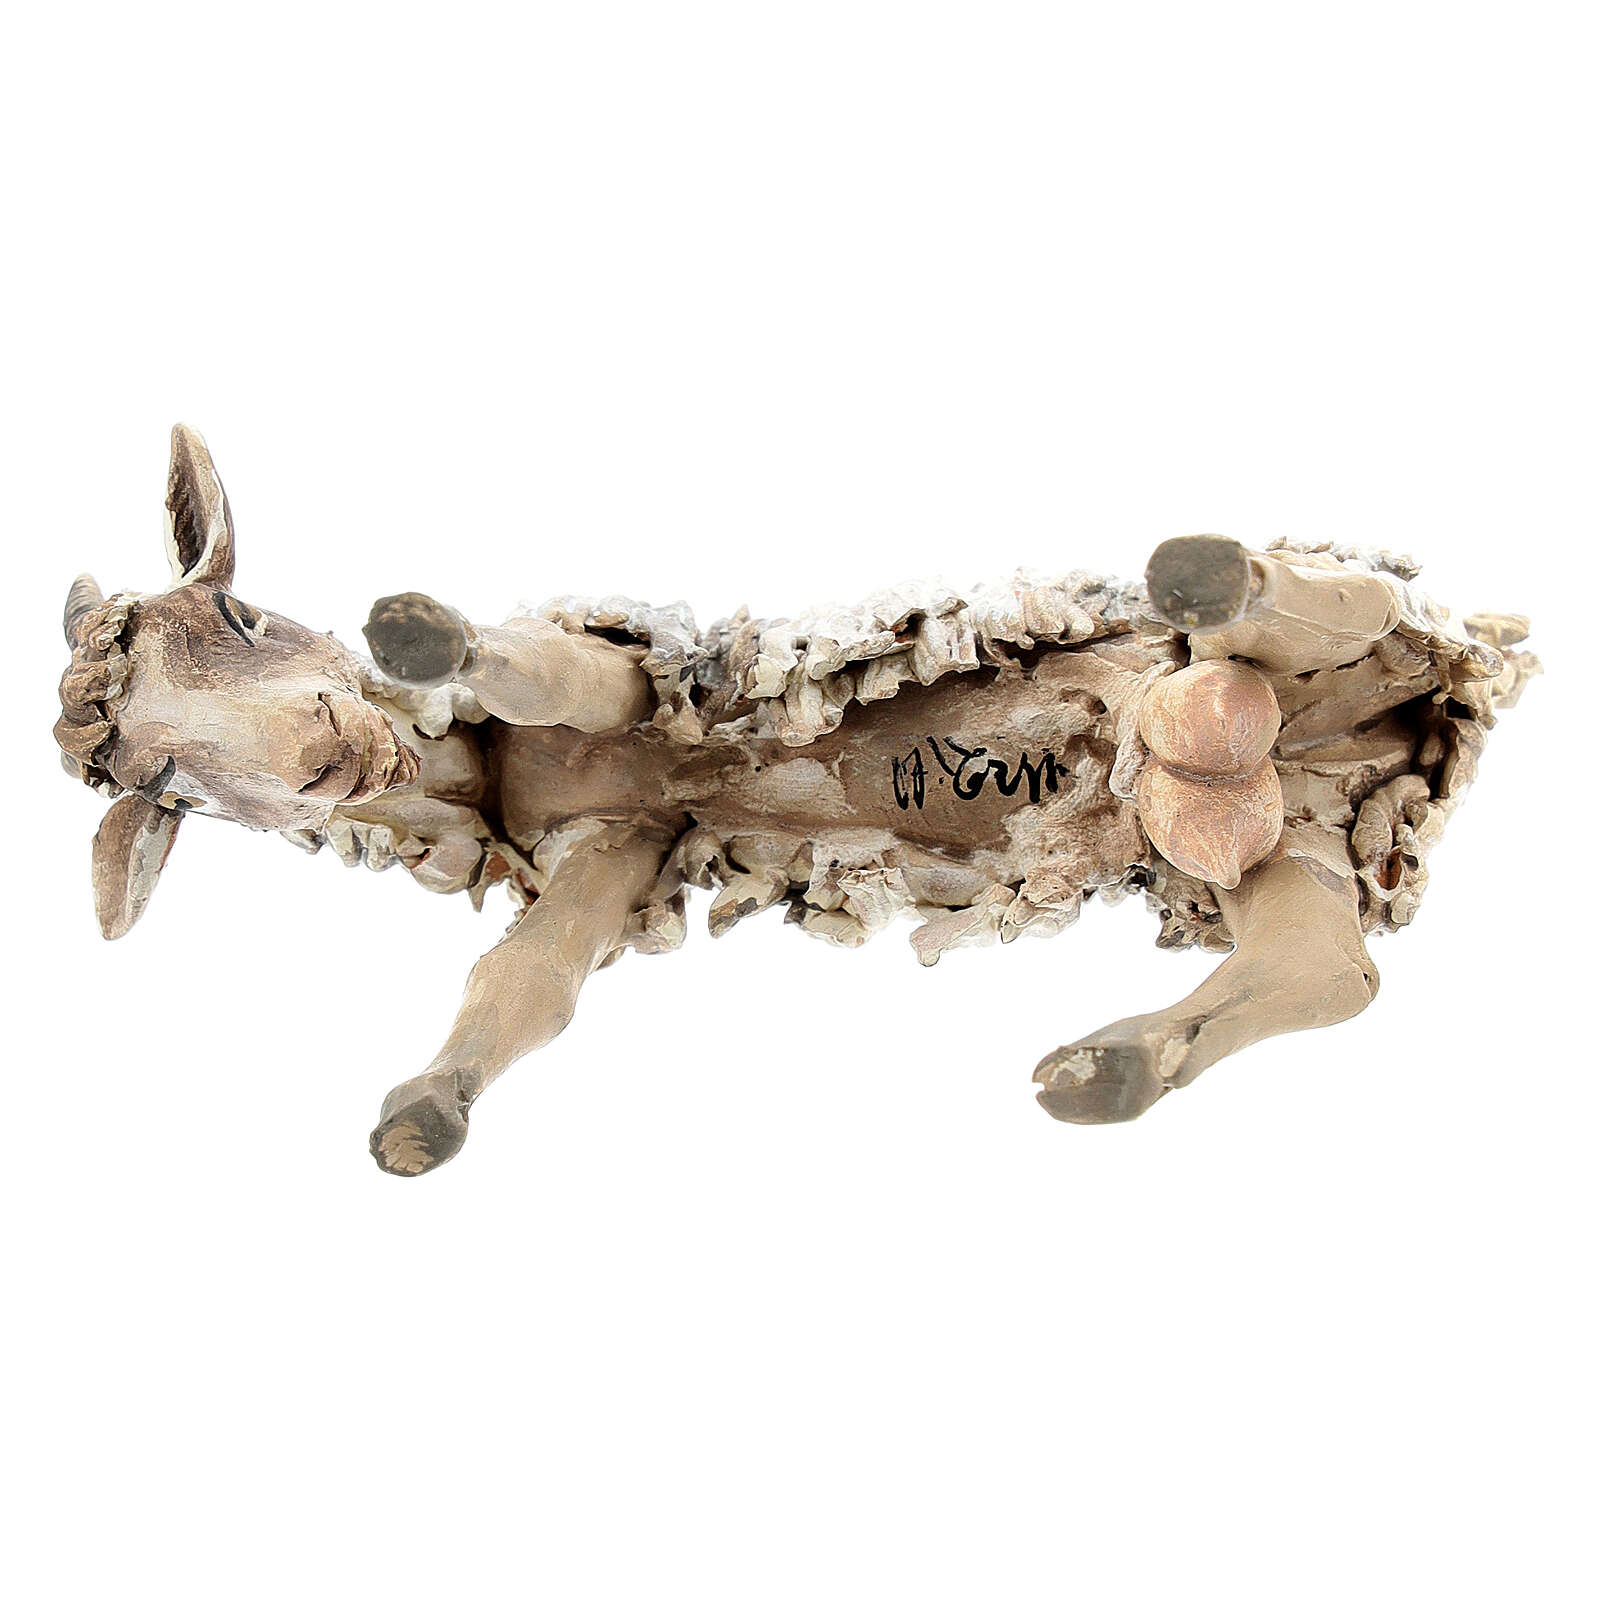 Capra testa bassa 13 cm Angela Tripi terracotta 4